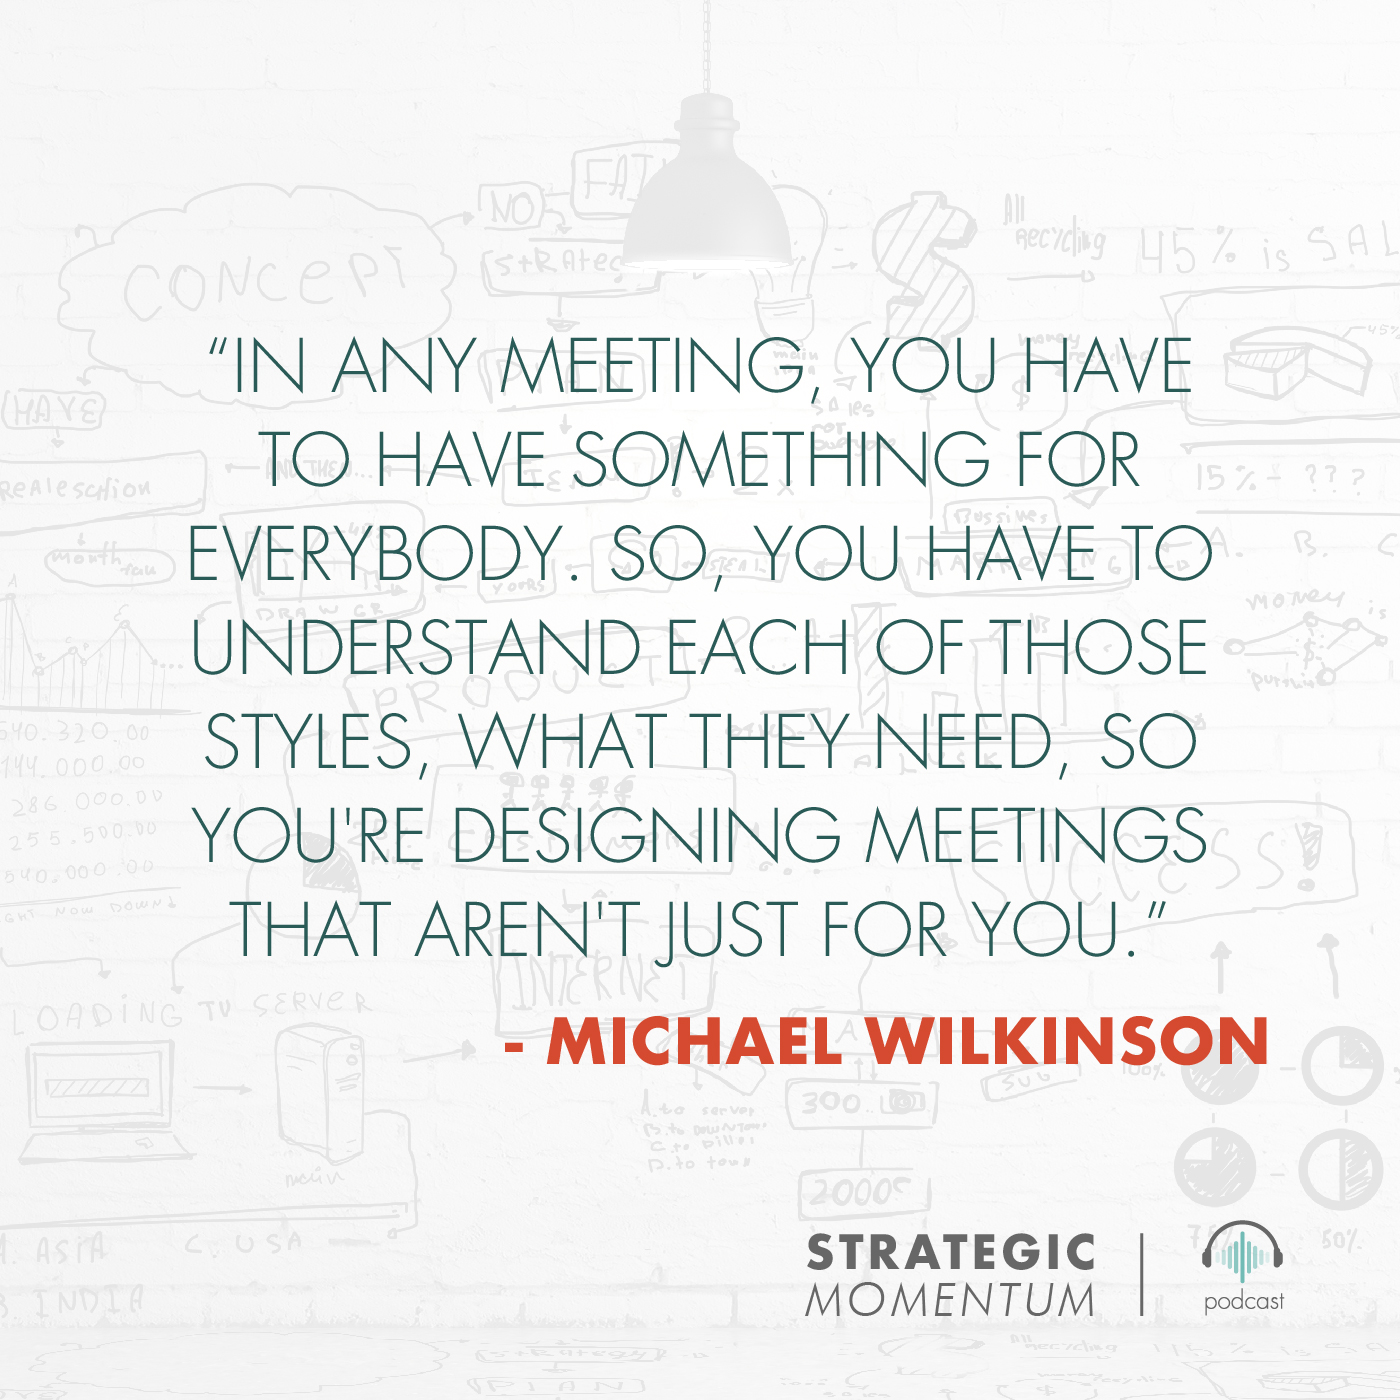 Art - Strategic Momentum 45 - Connie Steele - Michael Wilkinson_Quote 6 - Tile - .jpg